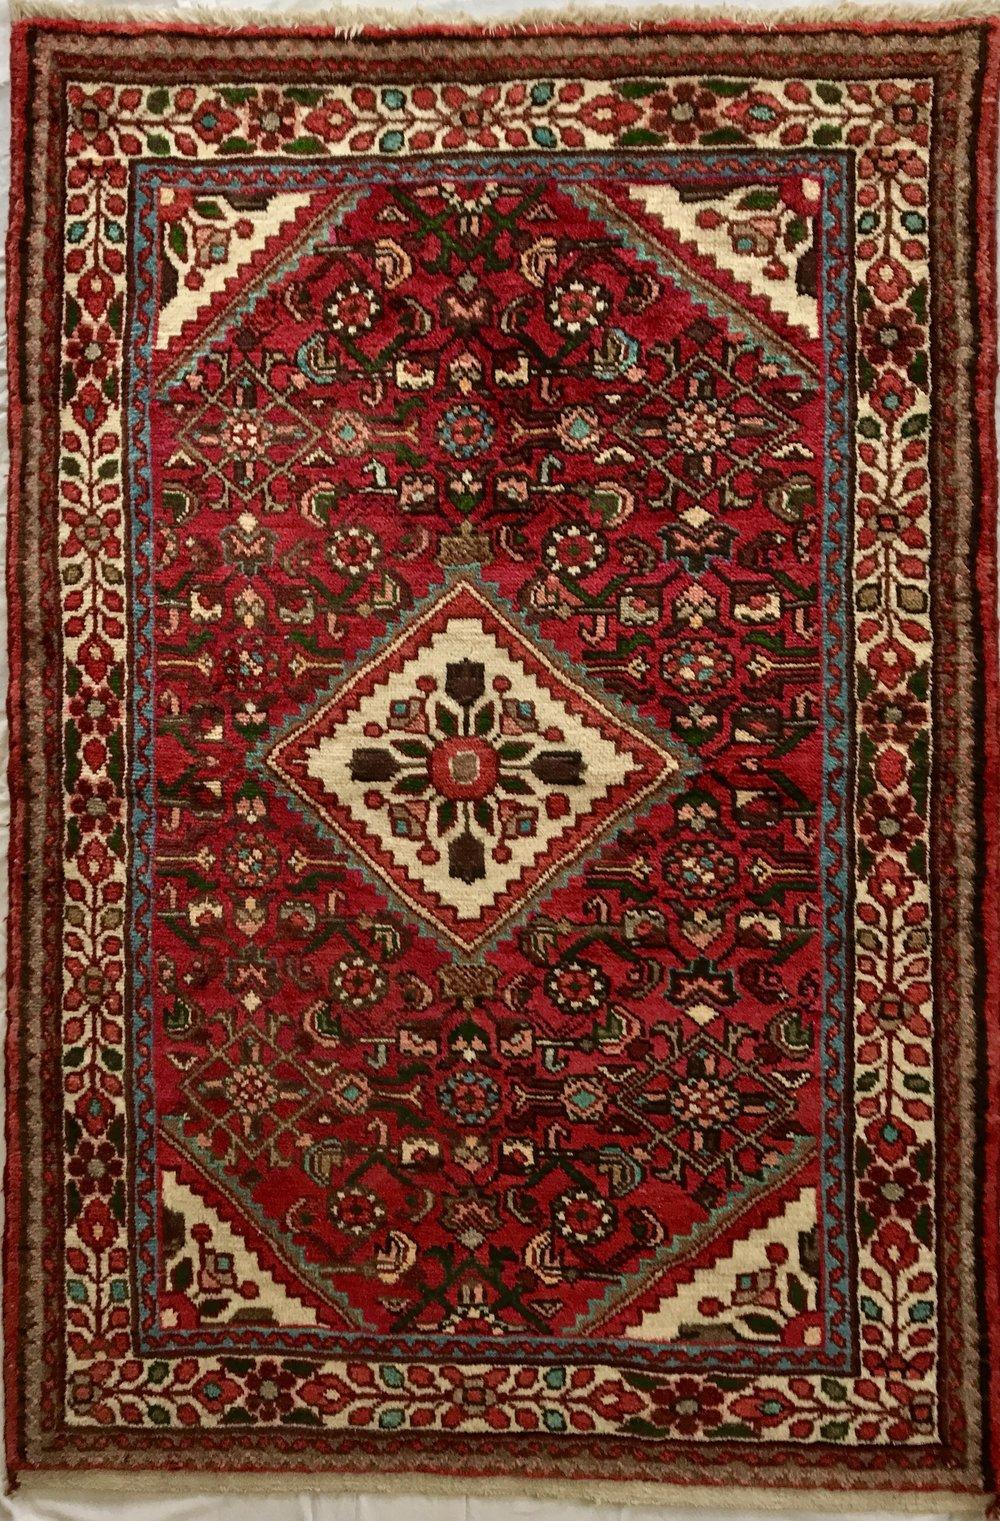 Persian Engelus Village rug (161*108 cm)